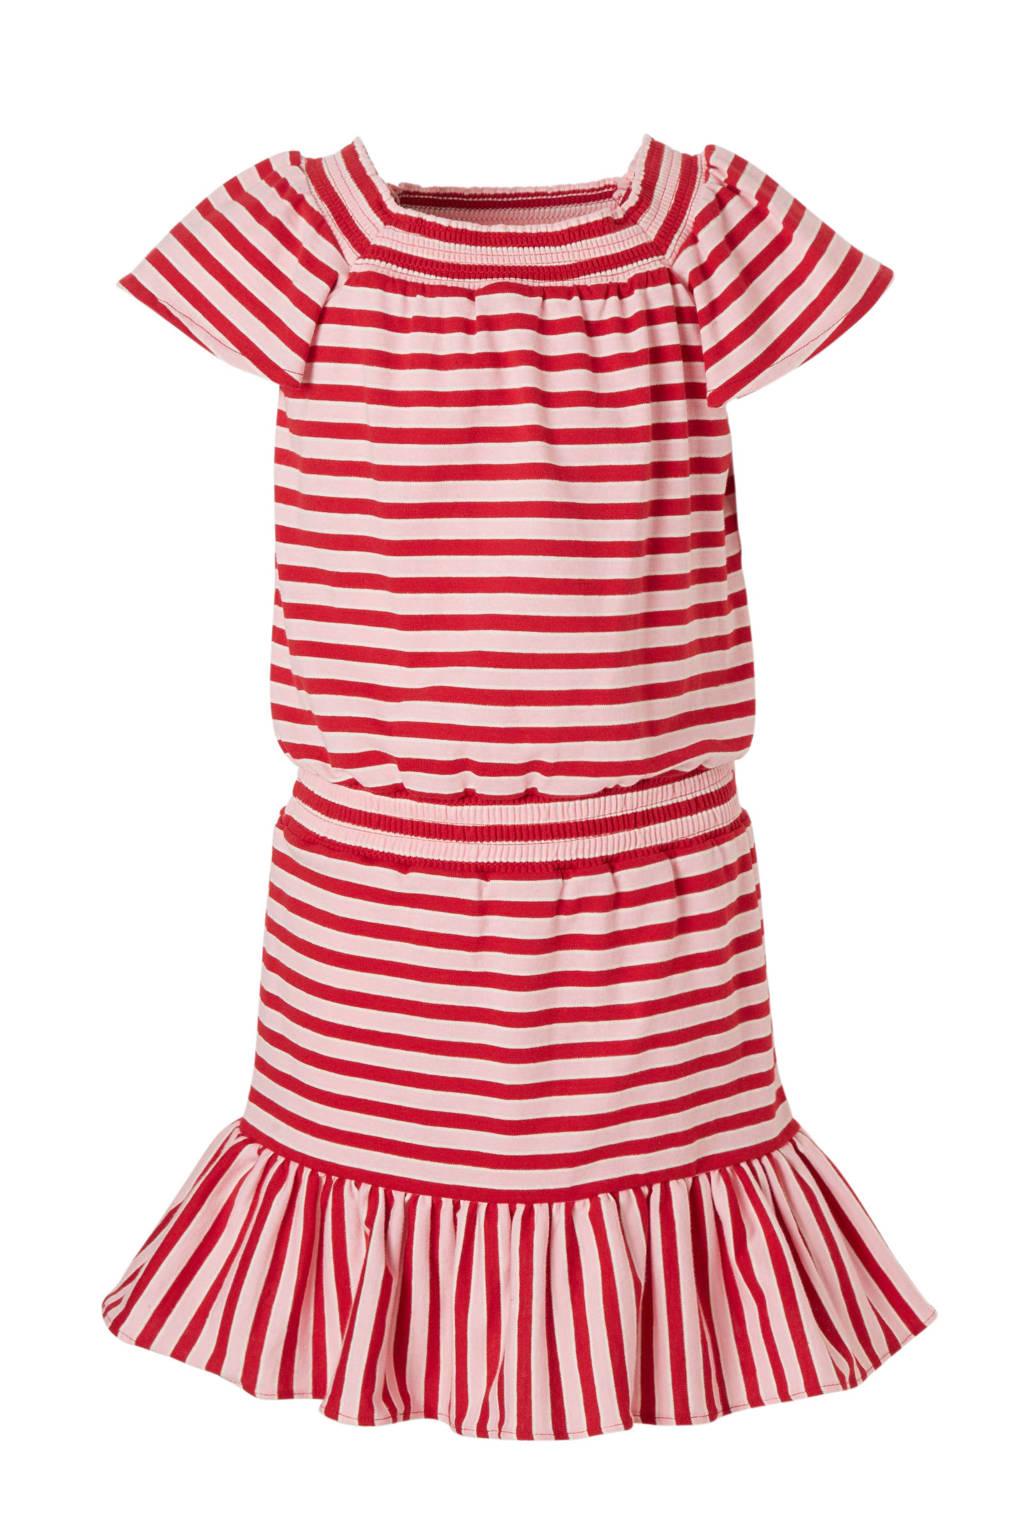 Scotch & Soda gestreepte jurk rood/wit, Rood/wit